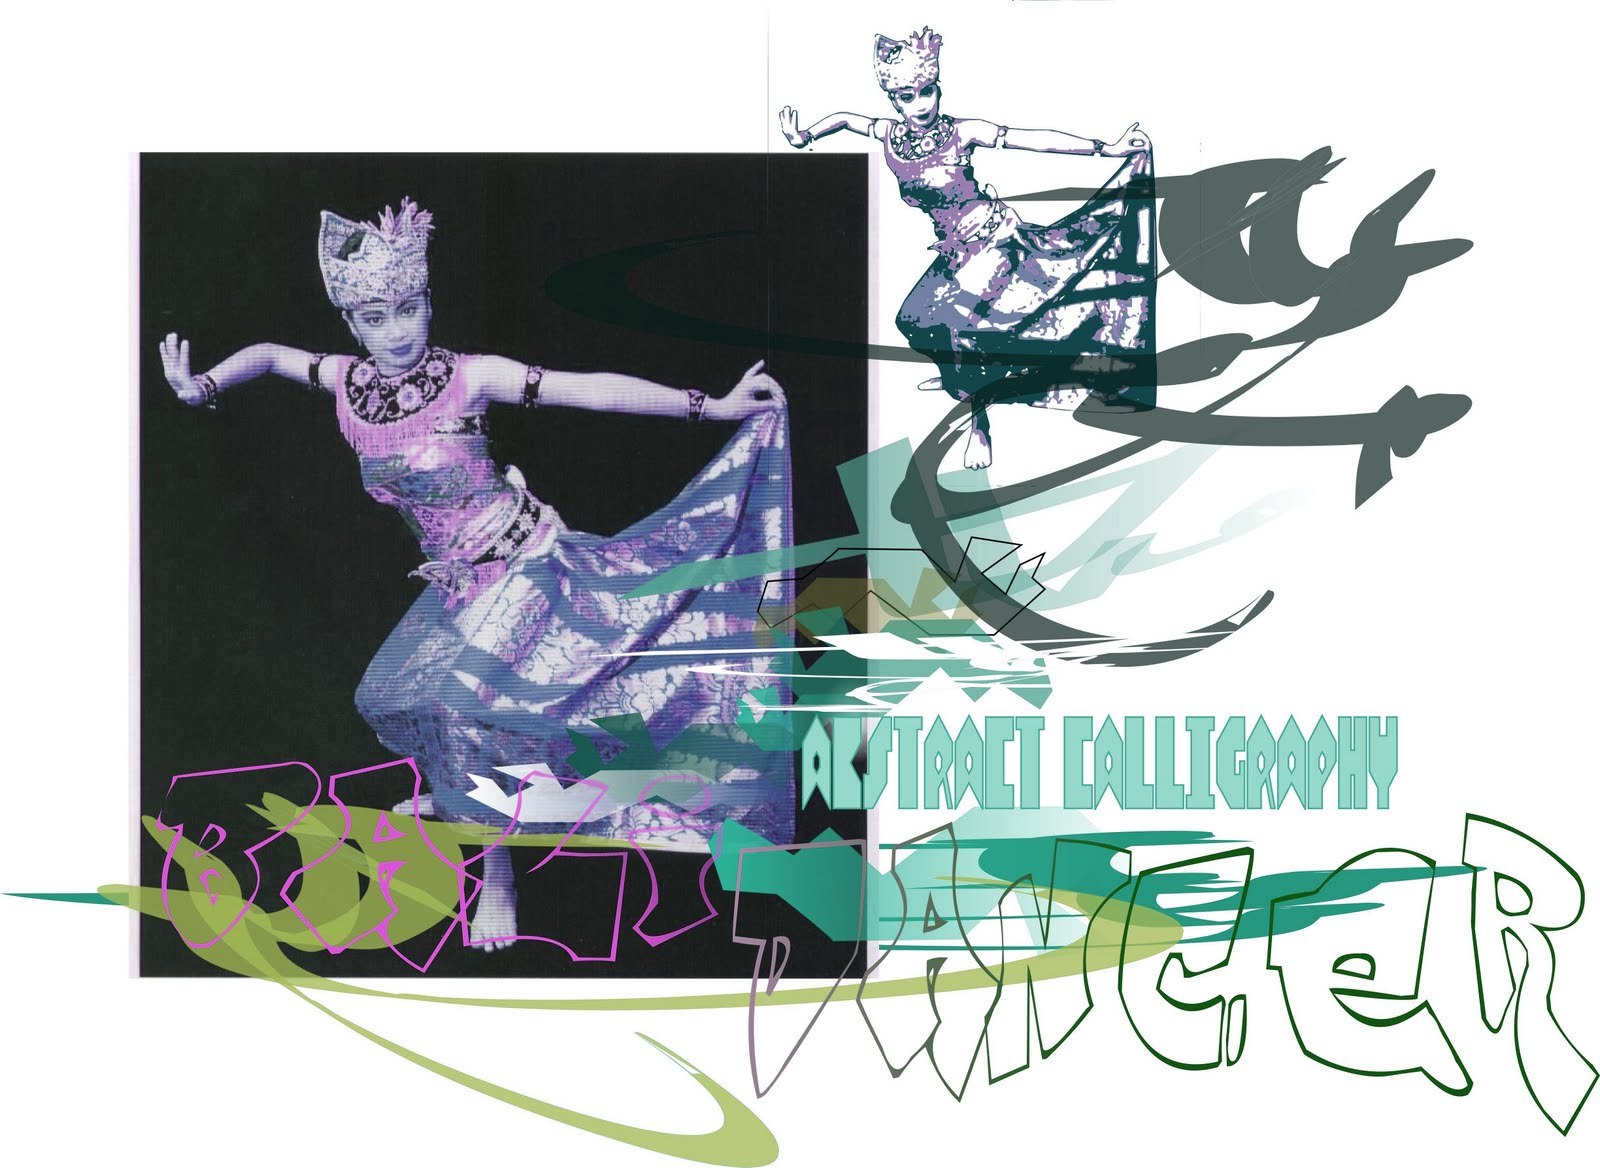 http://2.bp.blogspot.com/-yzDpVe_jZvE/TnLaJDHh12I/AAAAAAAAAv8/eq_2cmHJglM/s1600/ACGbalidancer1cJPG.jpg